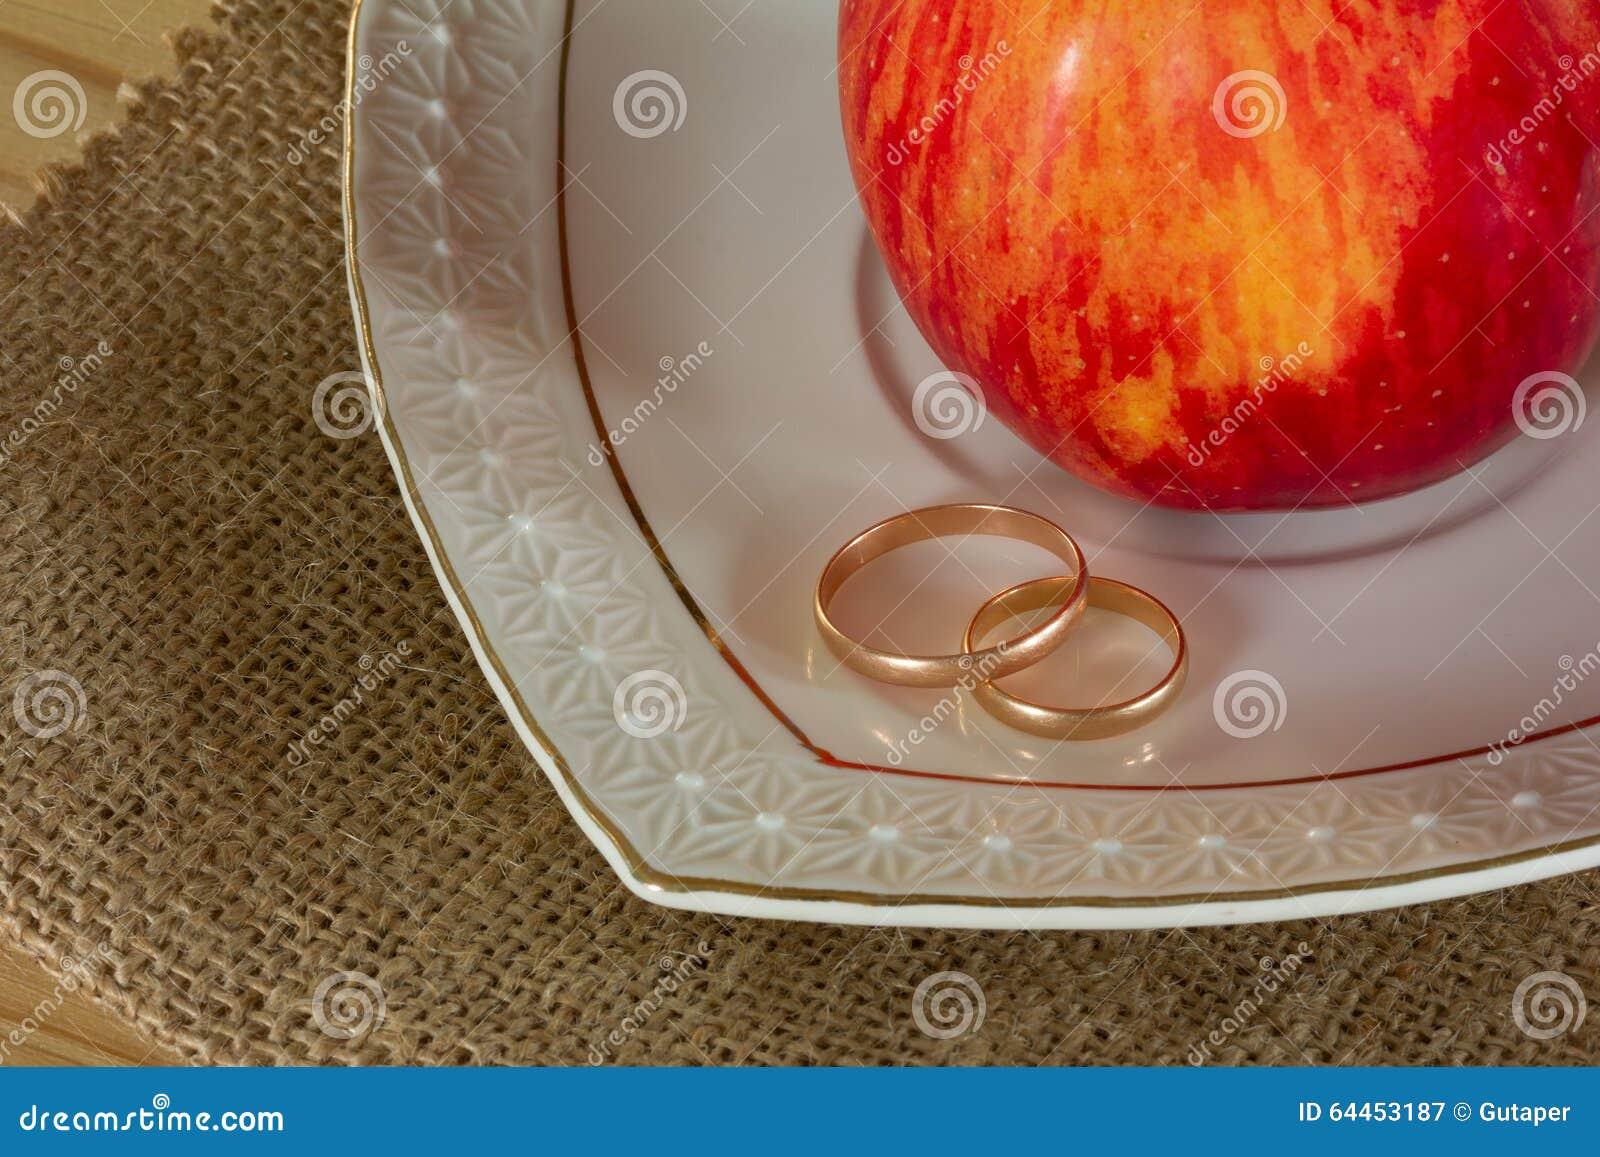 Eheringe und rotes reifes Apple